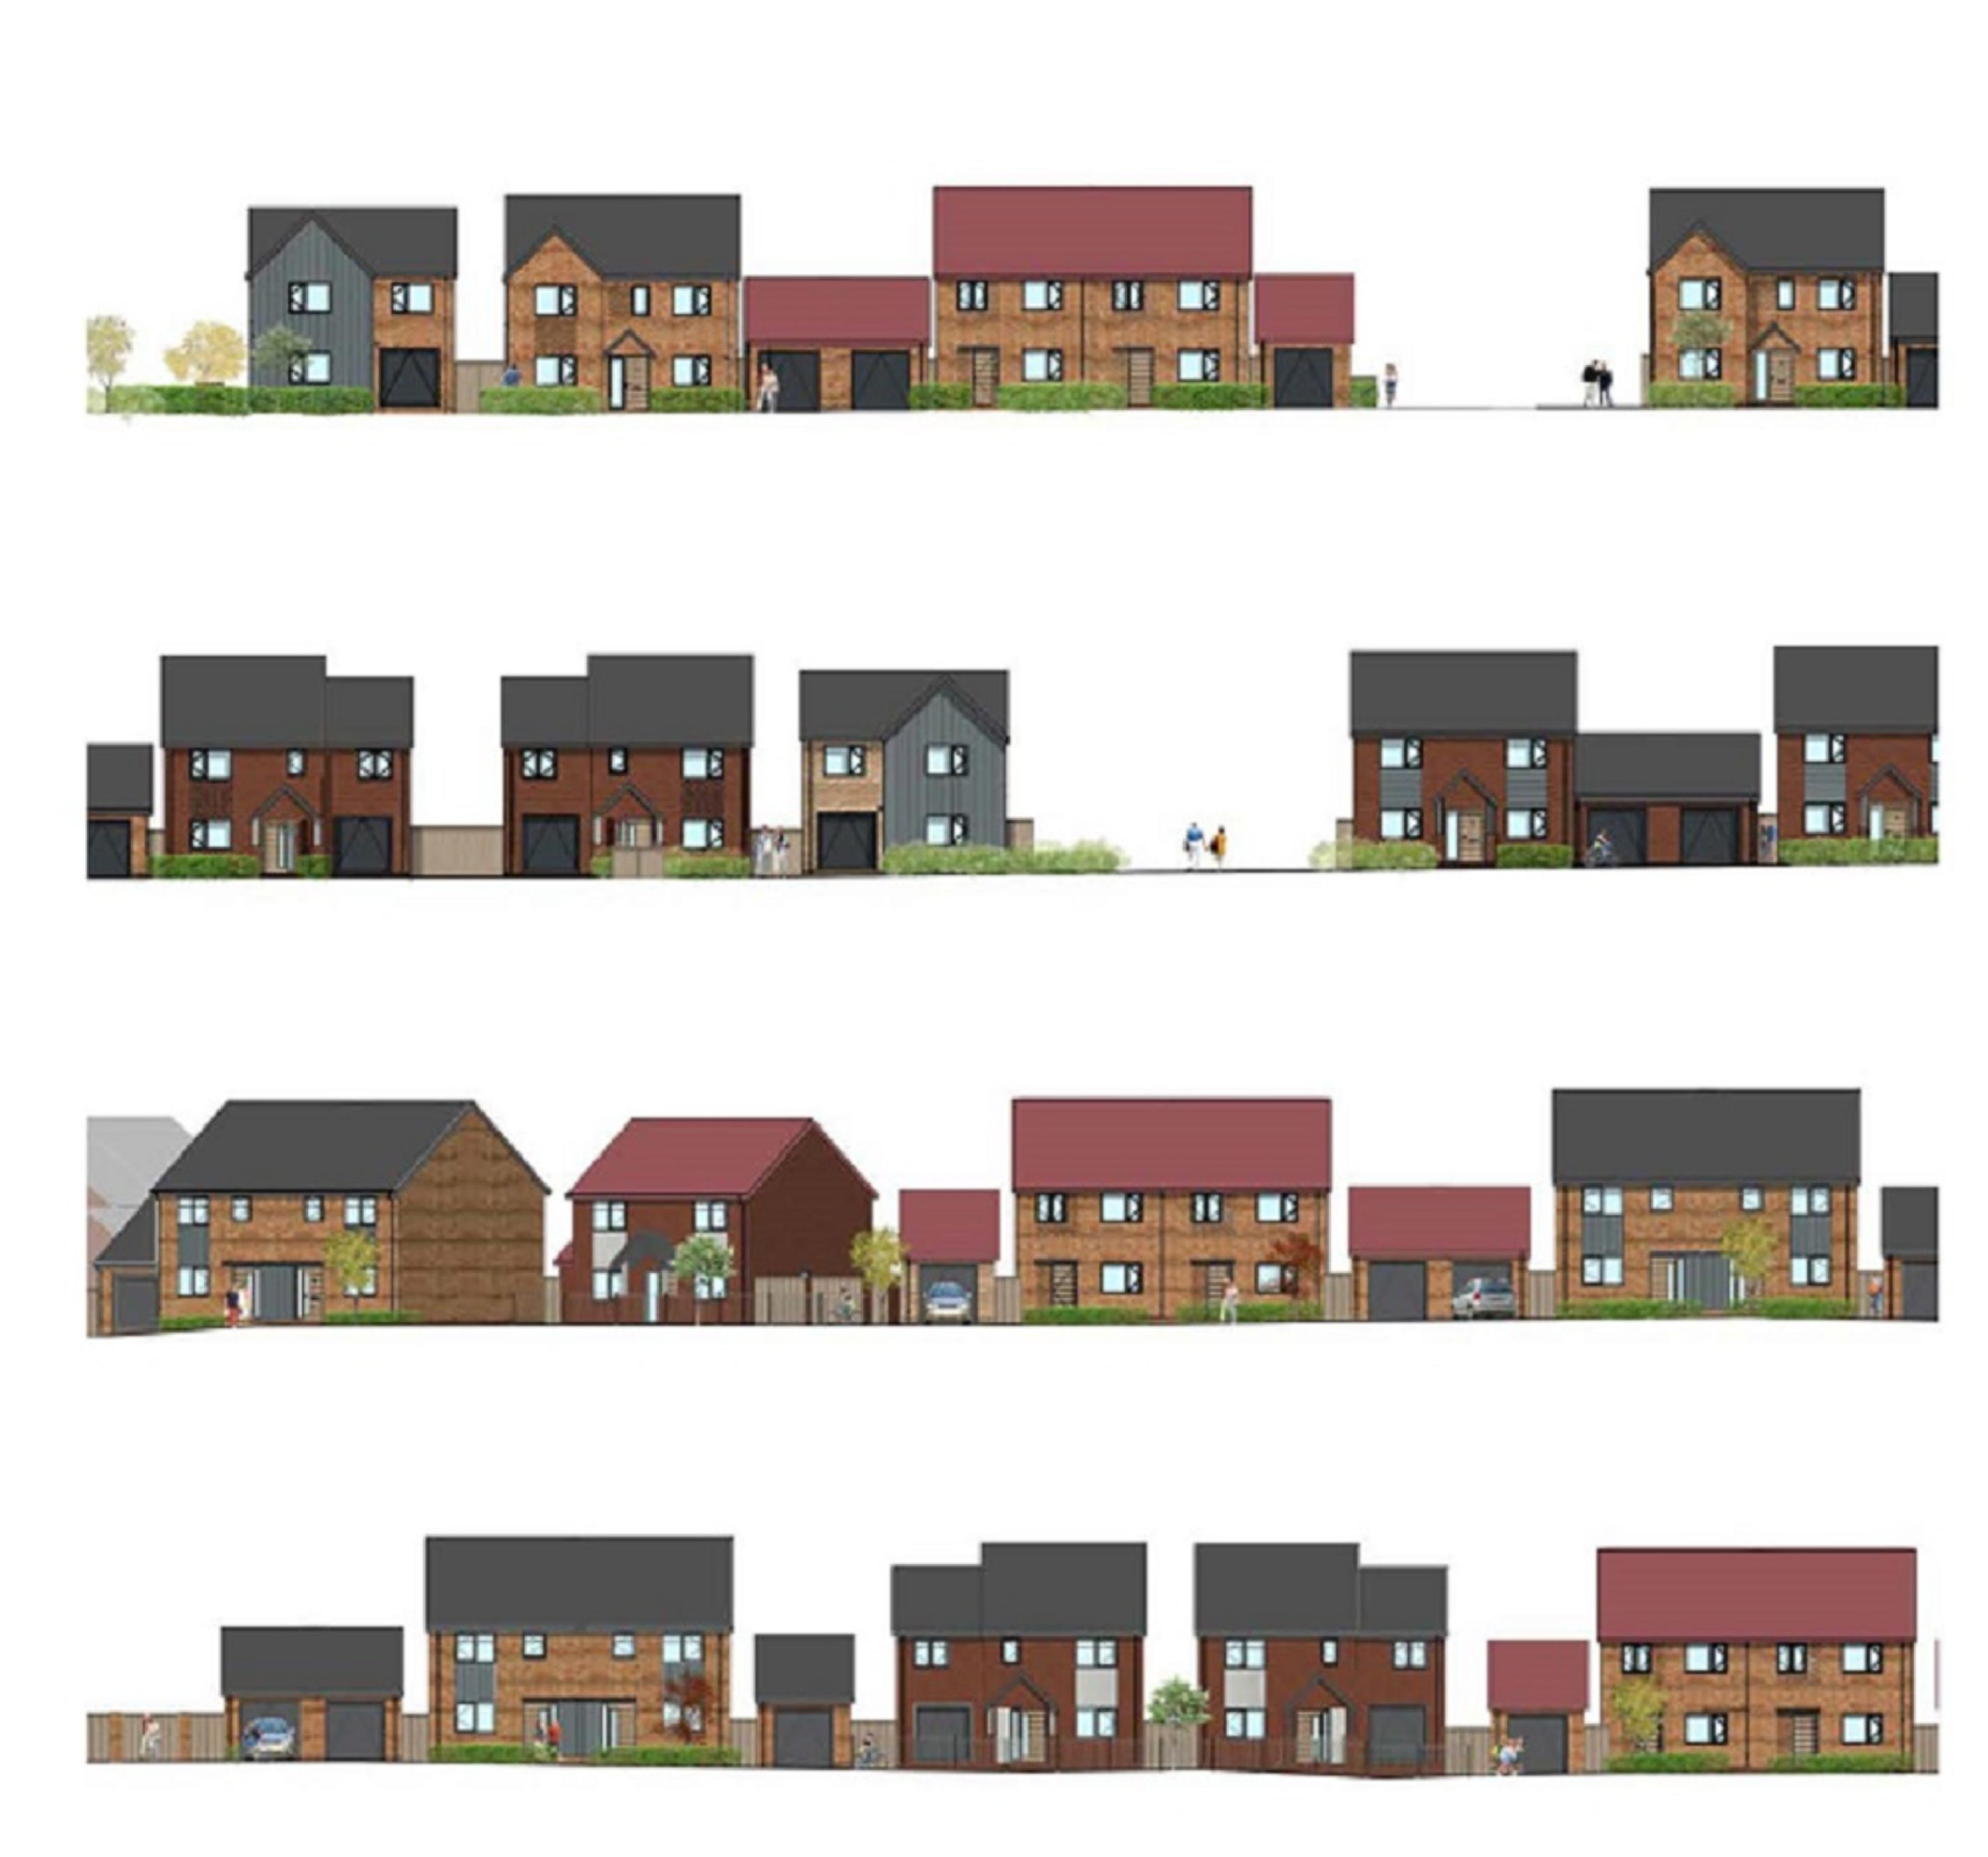 Carter Dene - proposed street scenes